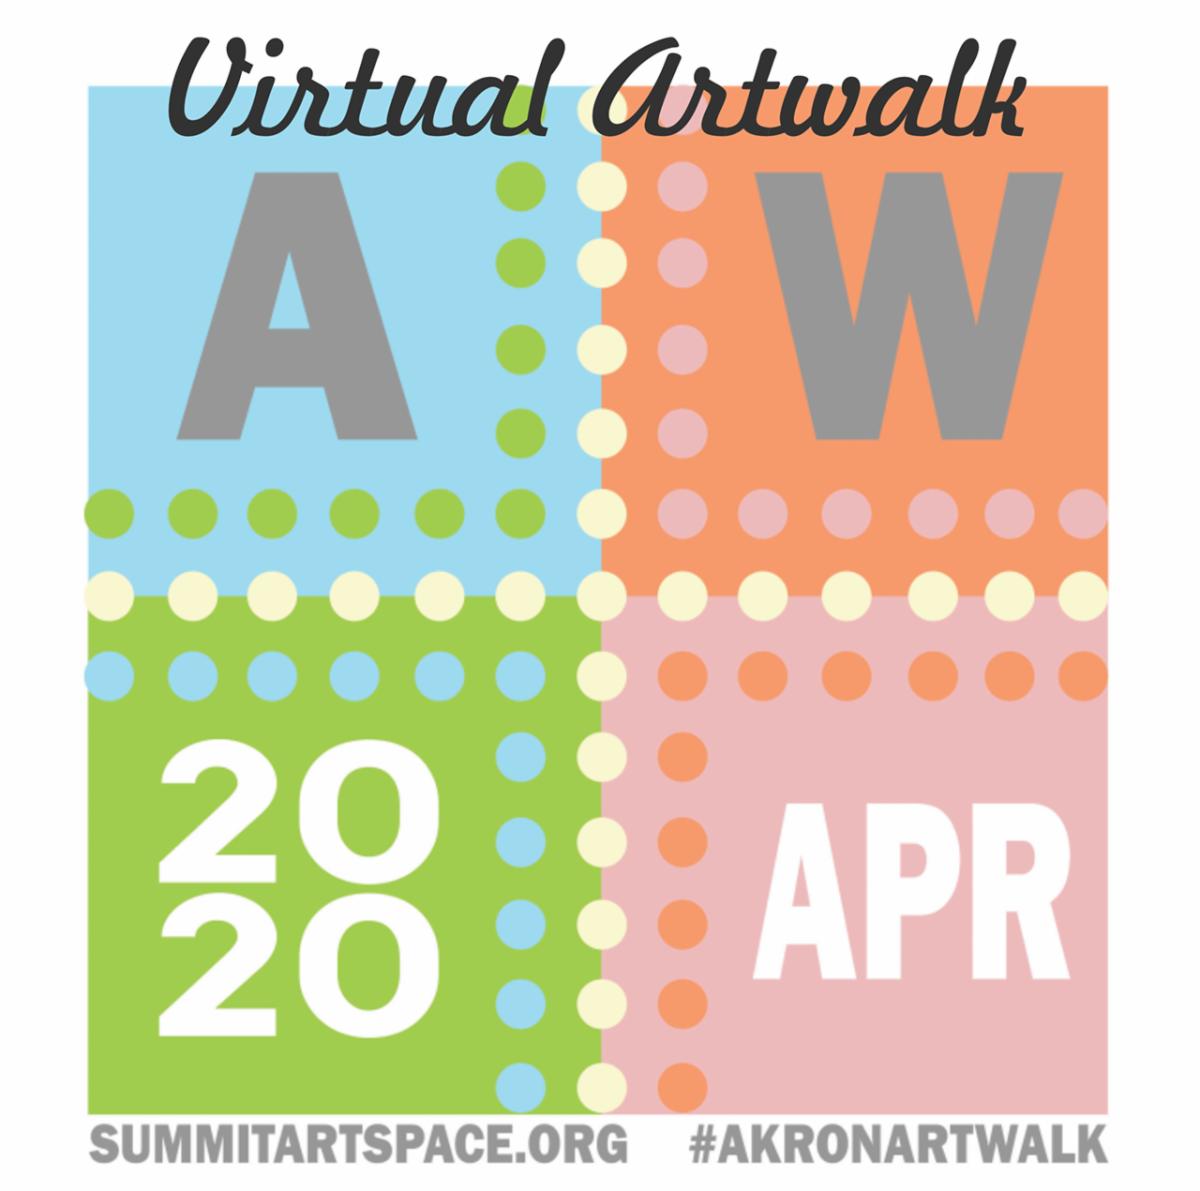 Virtual Artwalk April 2020